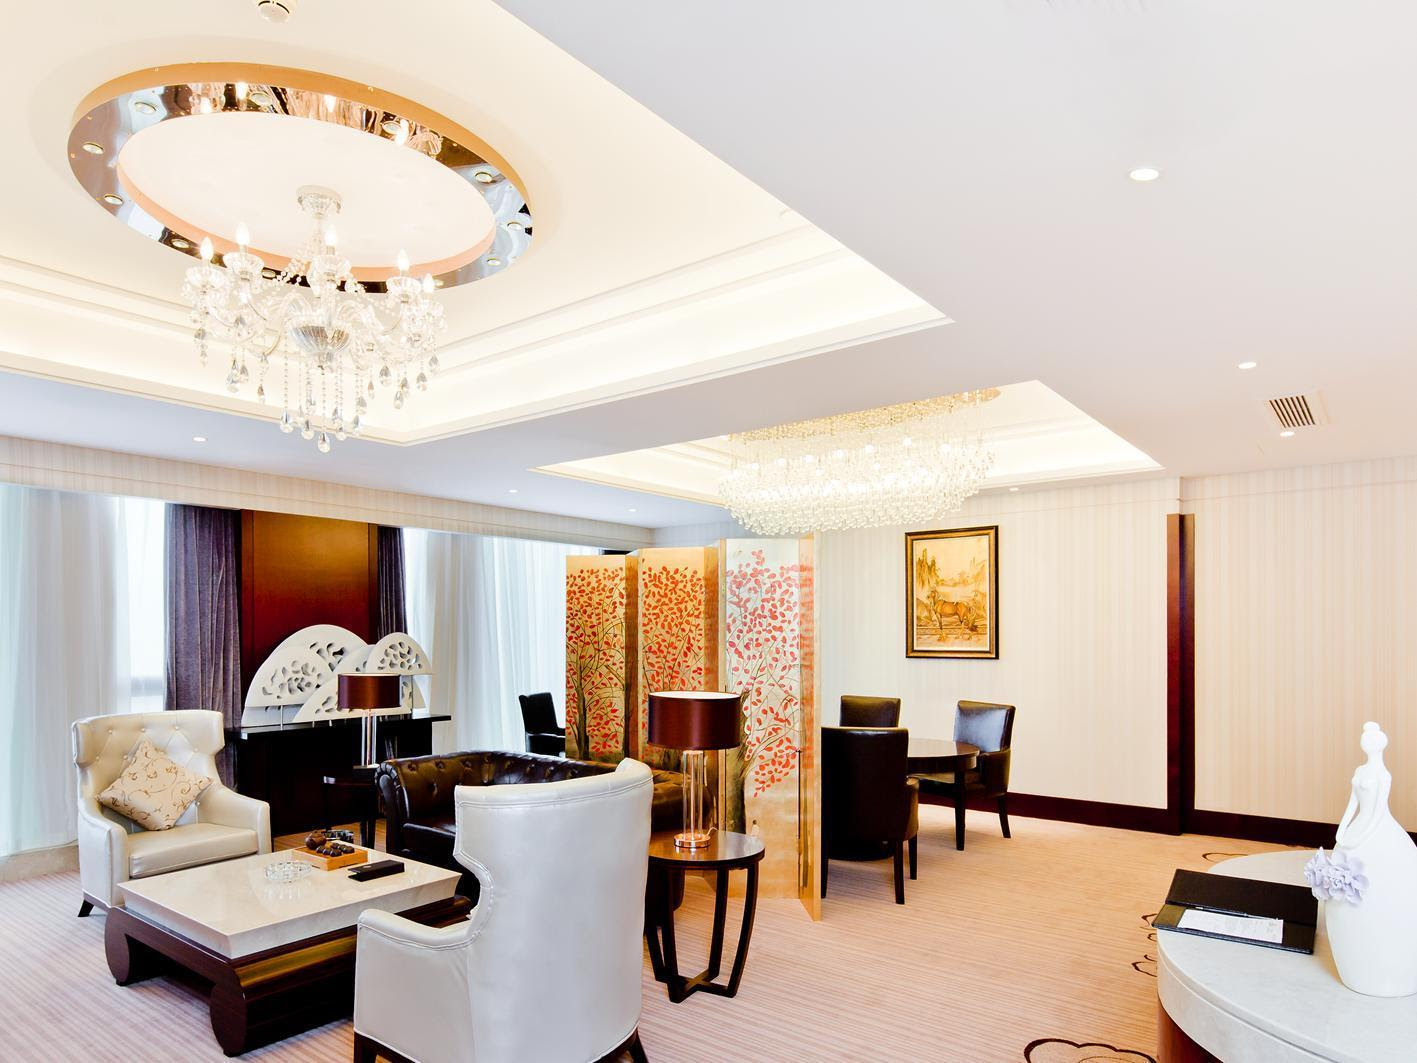 Discount Hangzhou White Horse Lake Jianguo Hotel